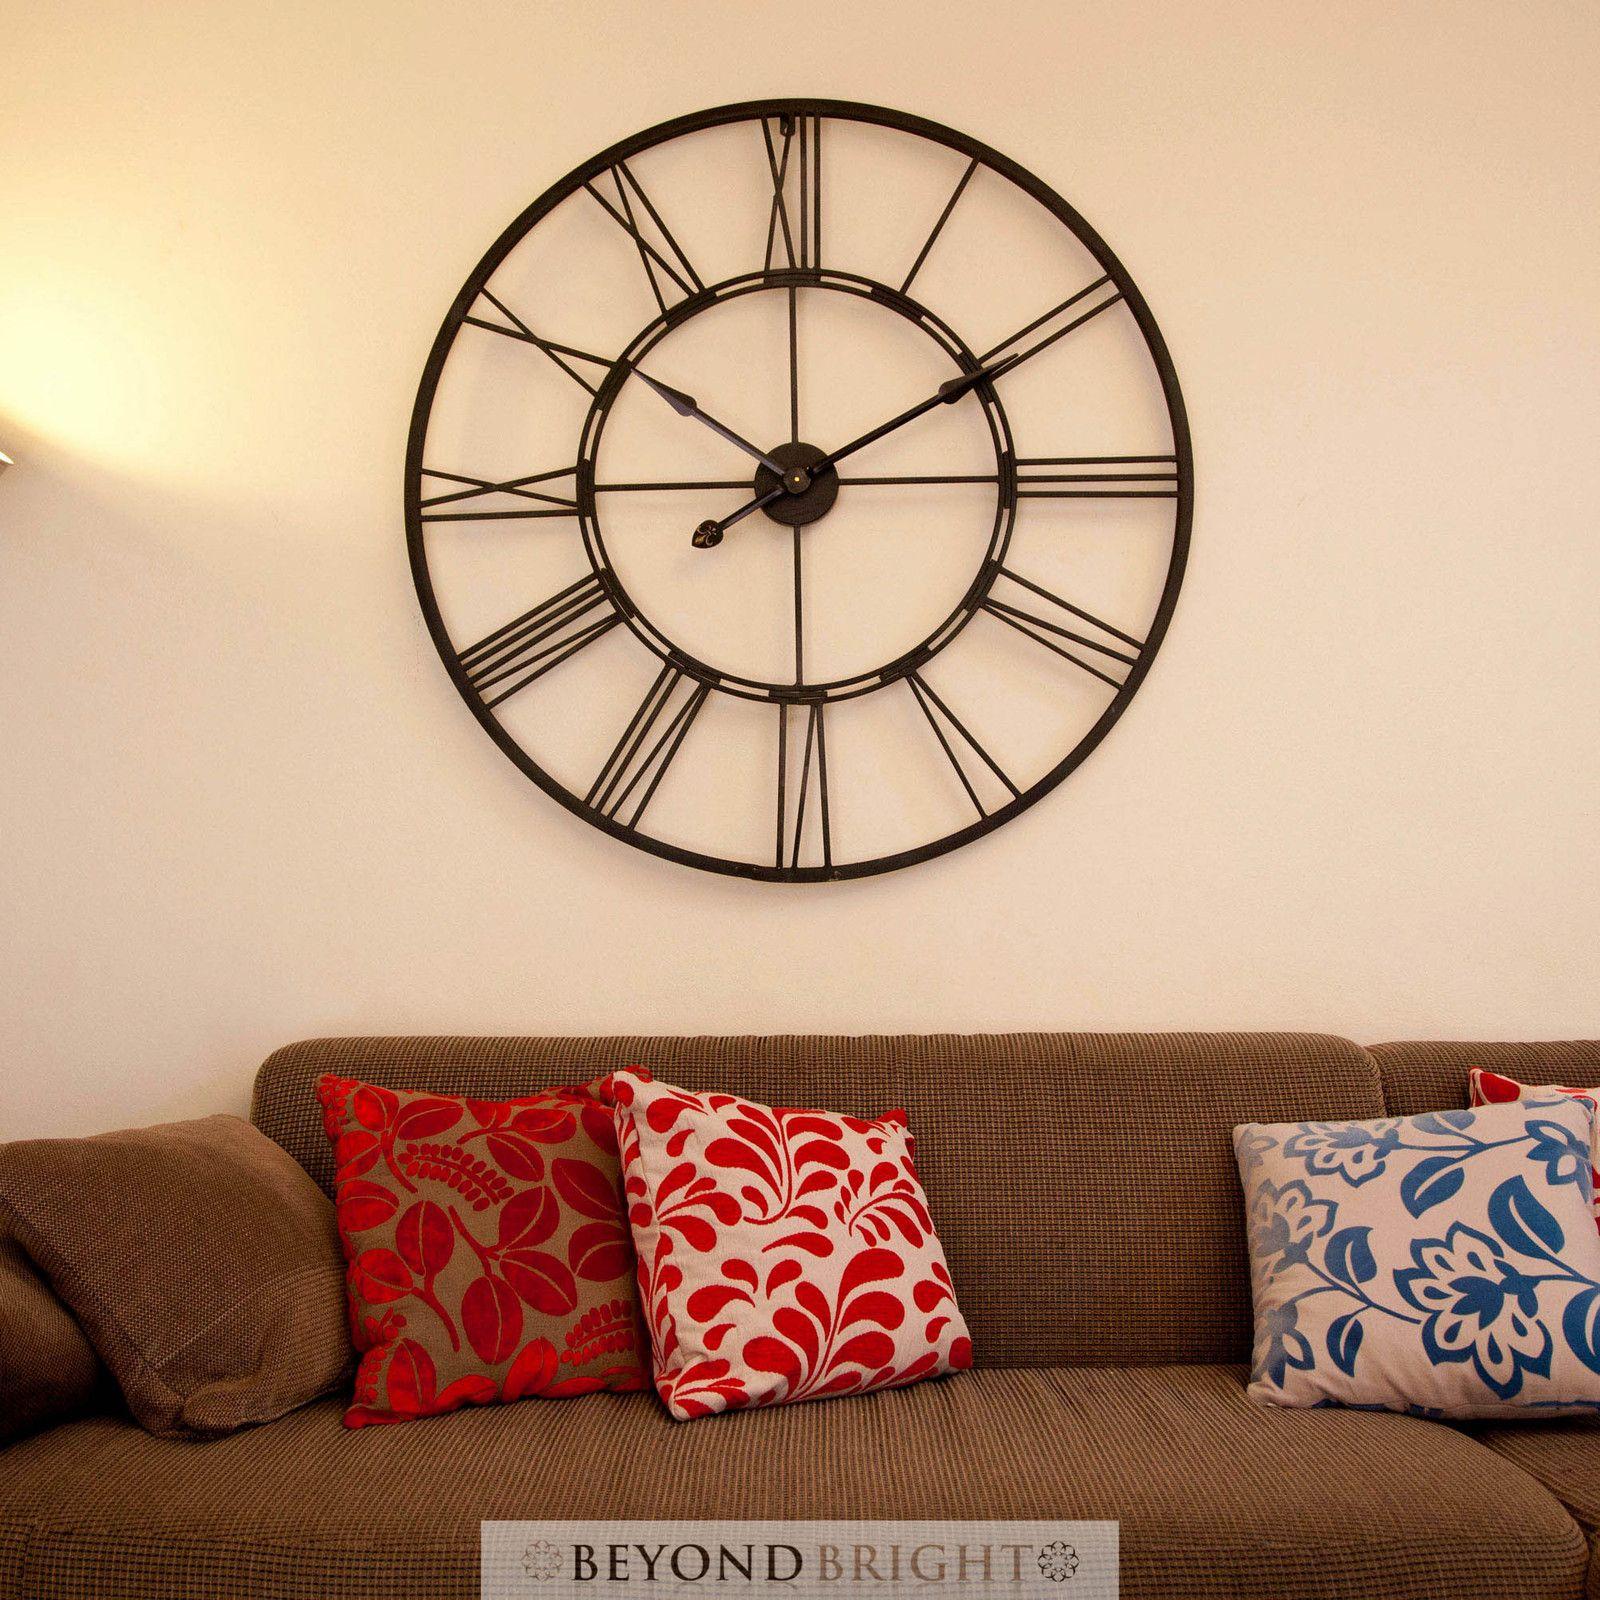 Bertha 101cm Wall Clock Industrial Clocks Large Wall Clock Wall Clock Industrial Clocks